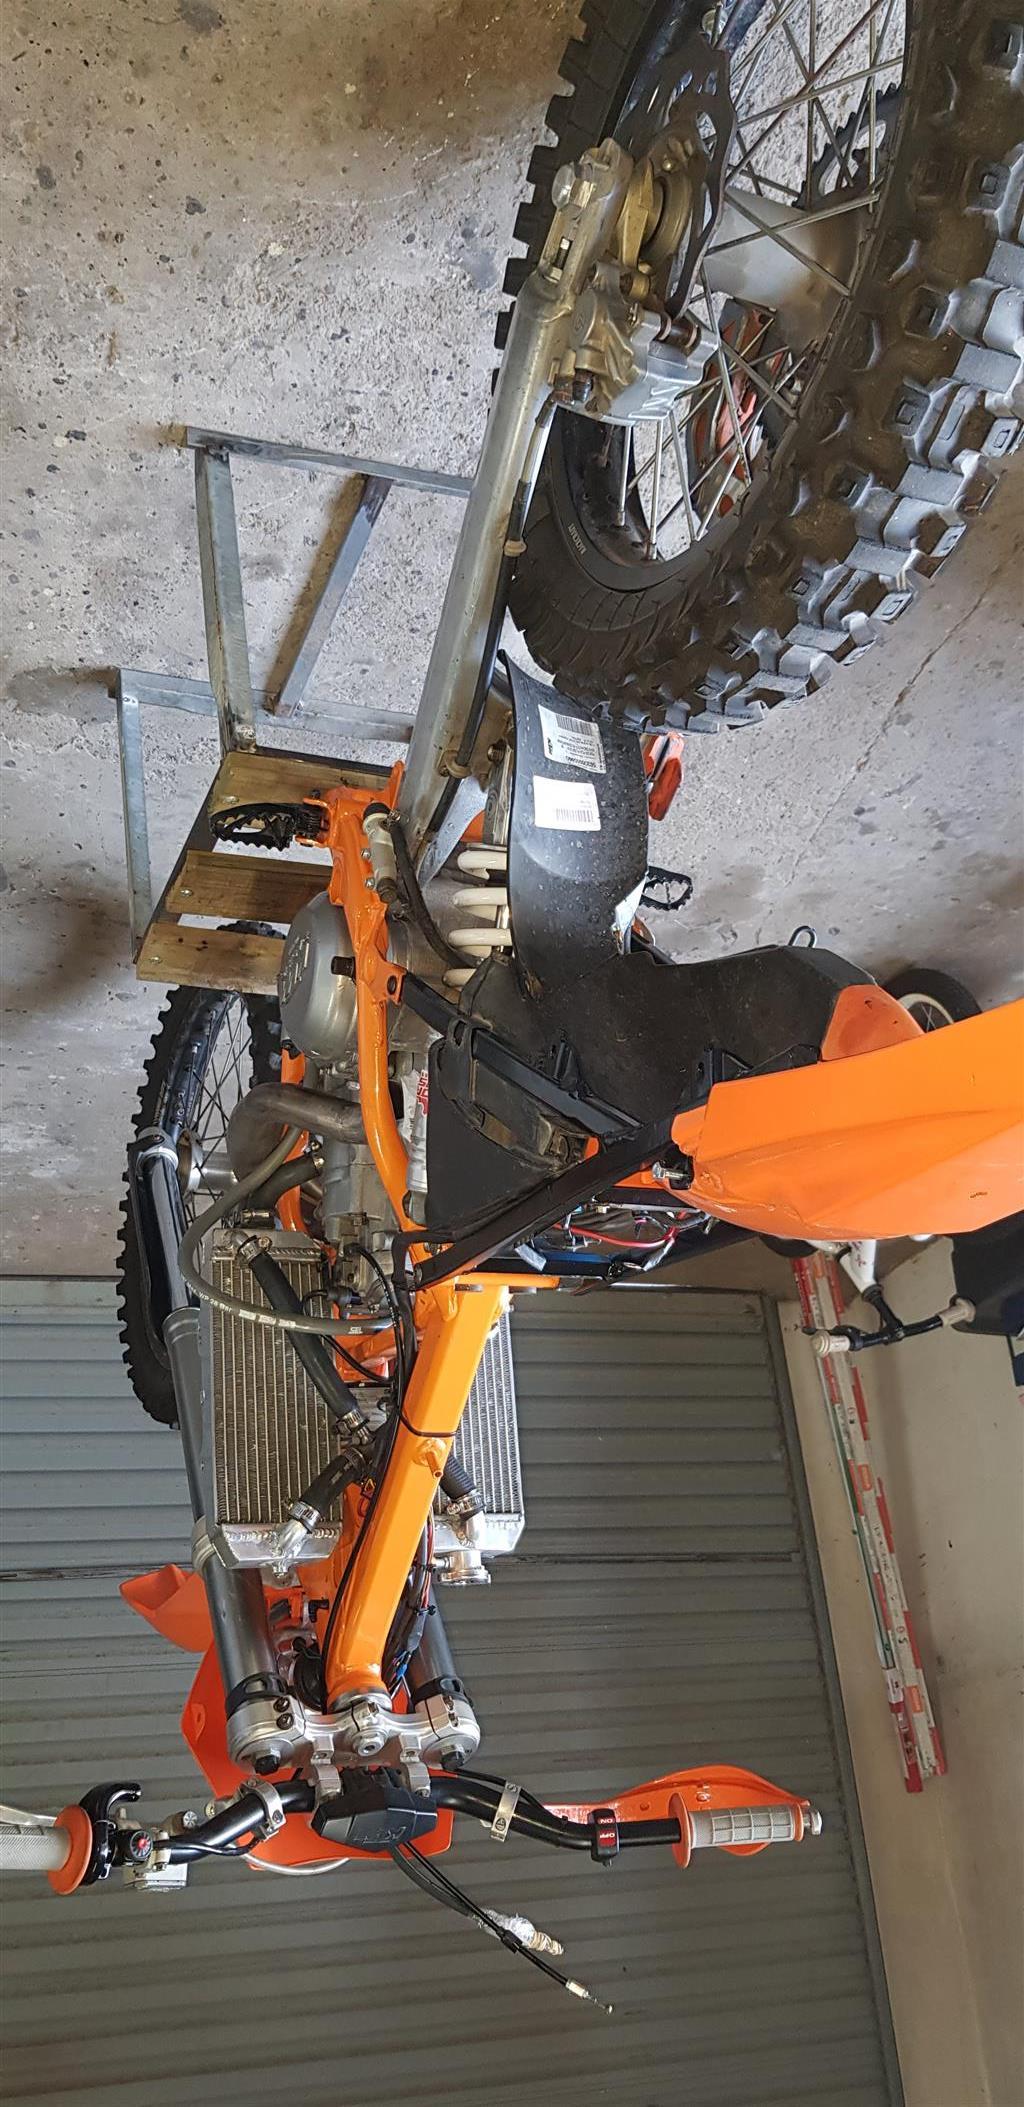 2000 KTM 400 EXC Racing